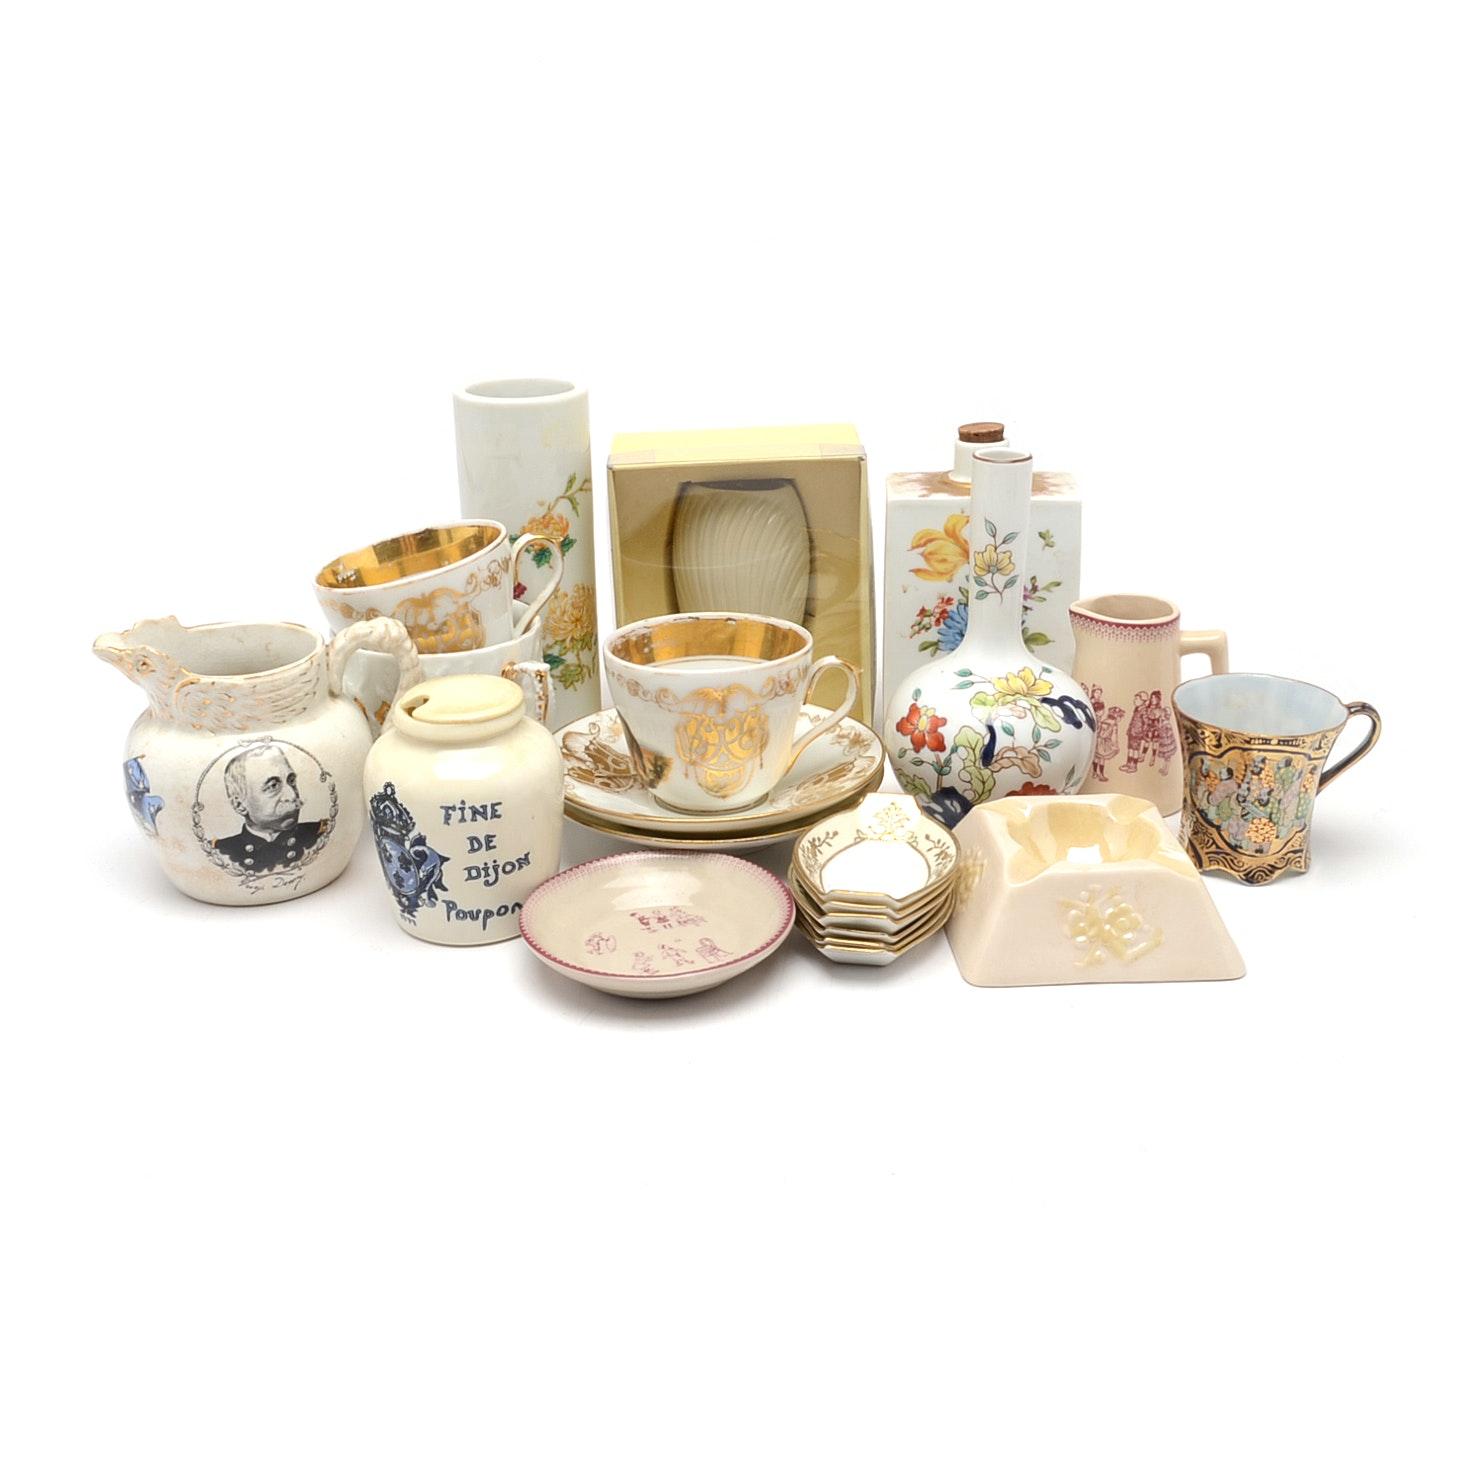 Assorted Vintage and Antique Porcelain Decor